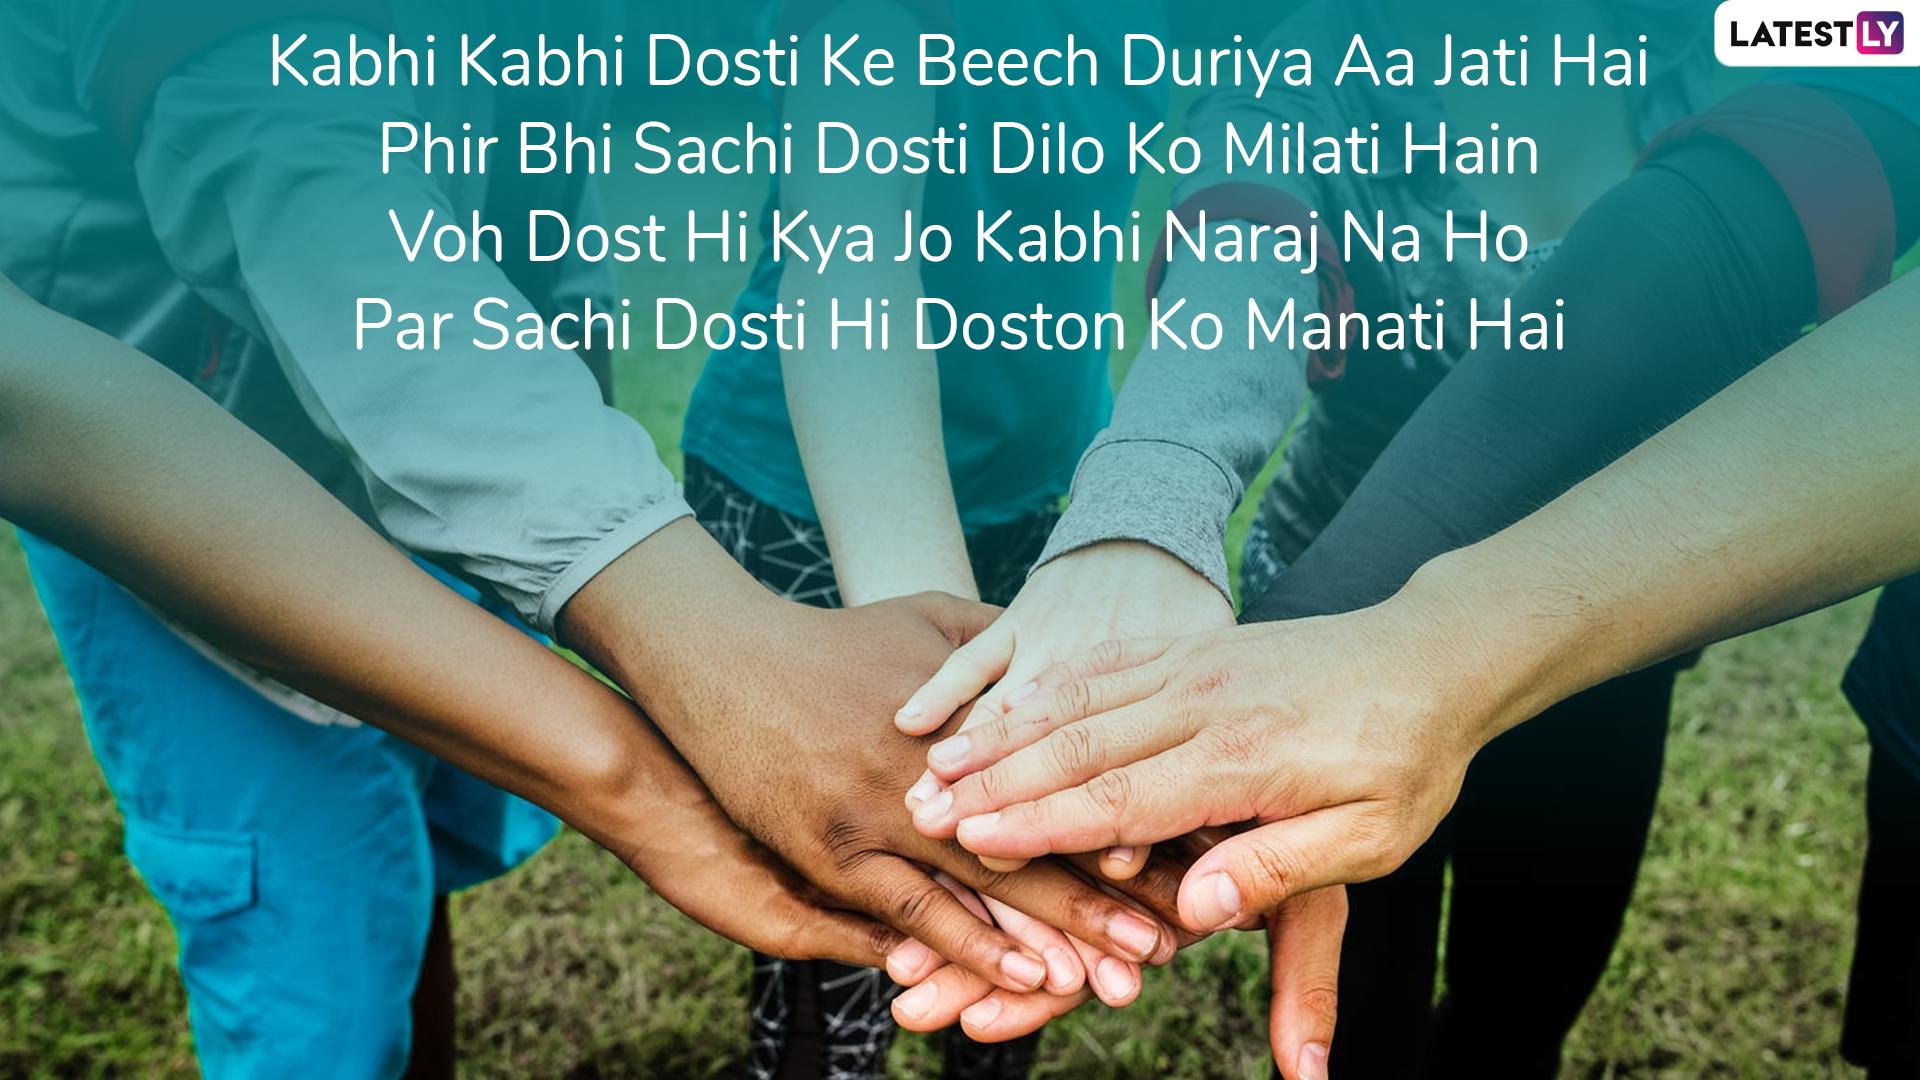 friendship day 2019 hindi wishes in advance: whatsapp